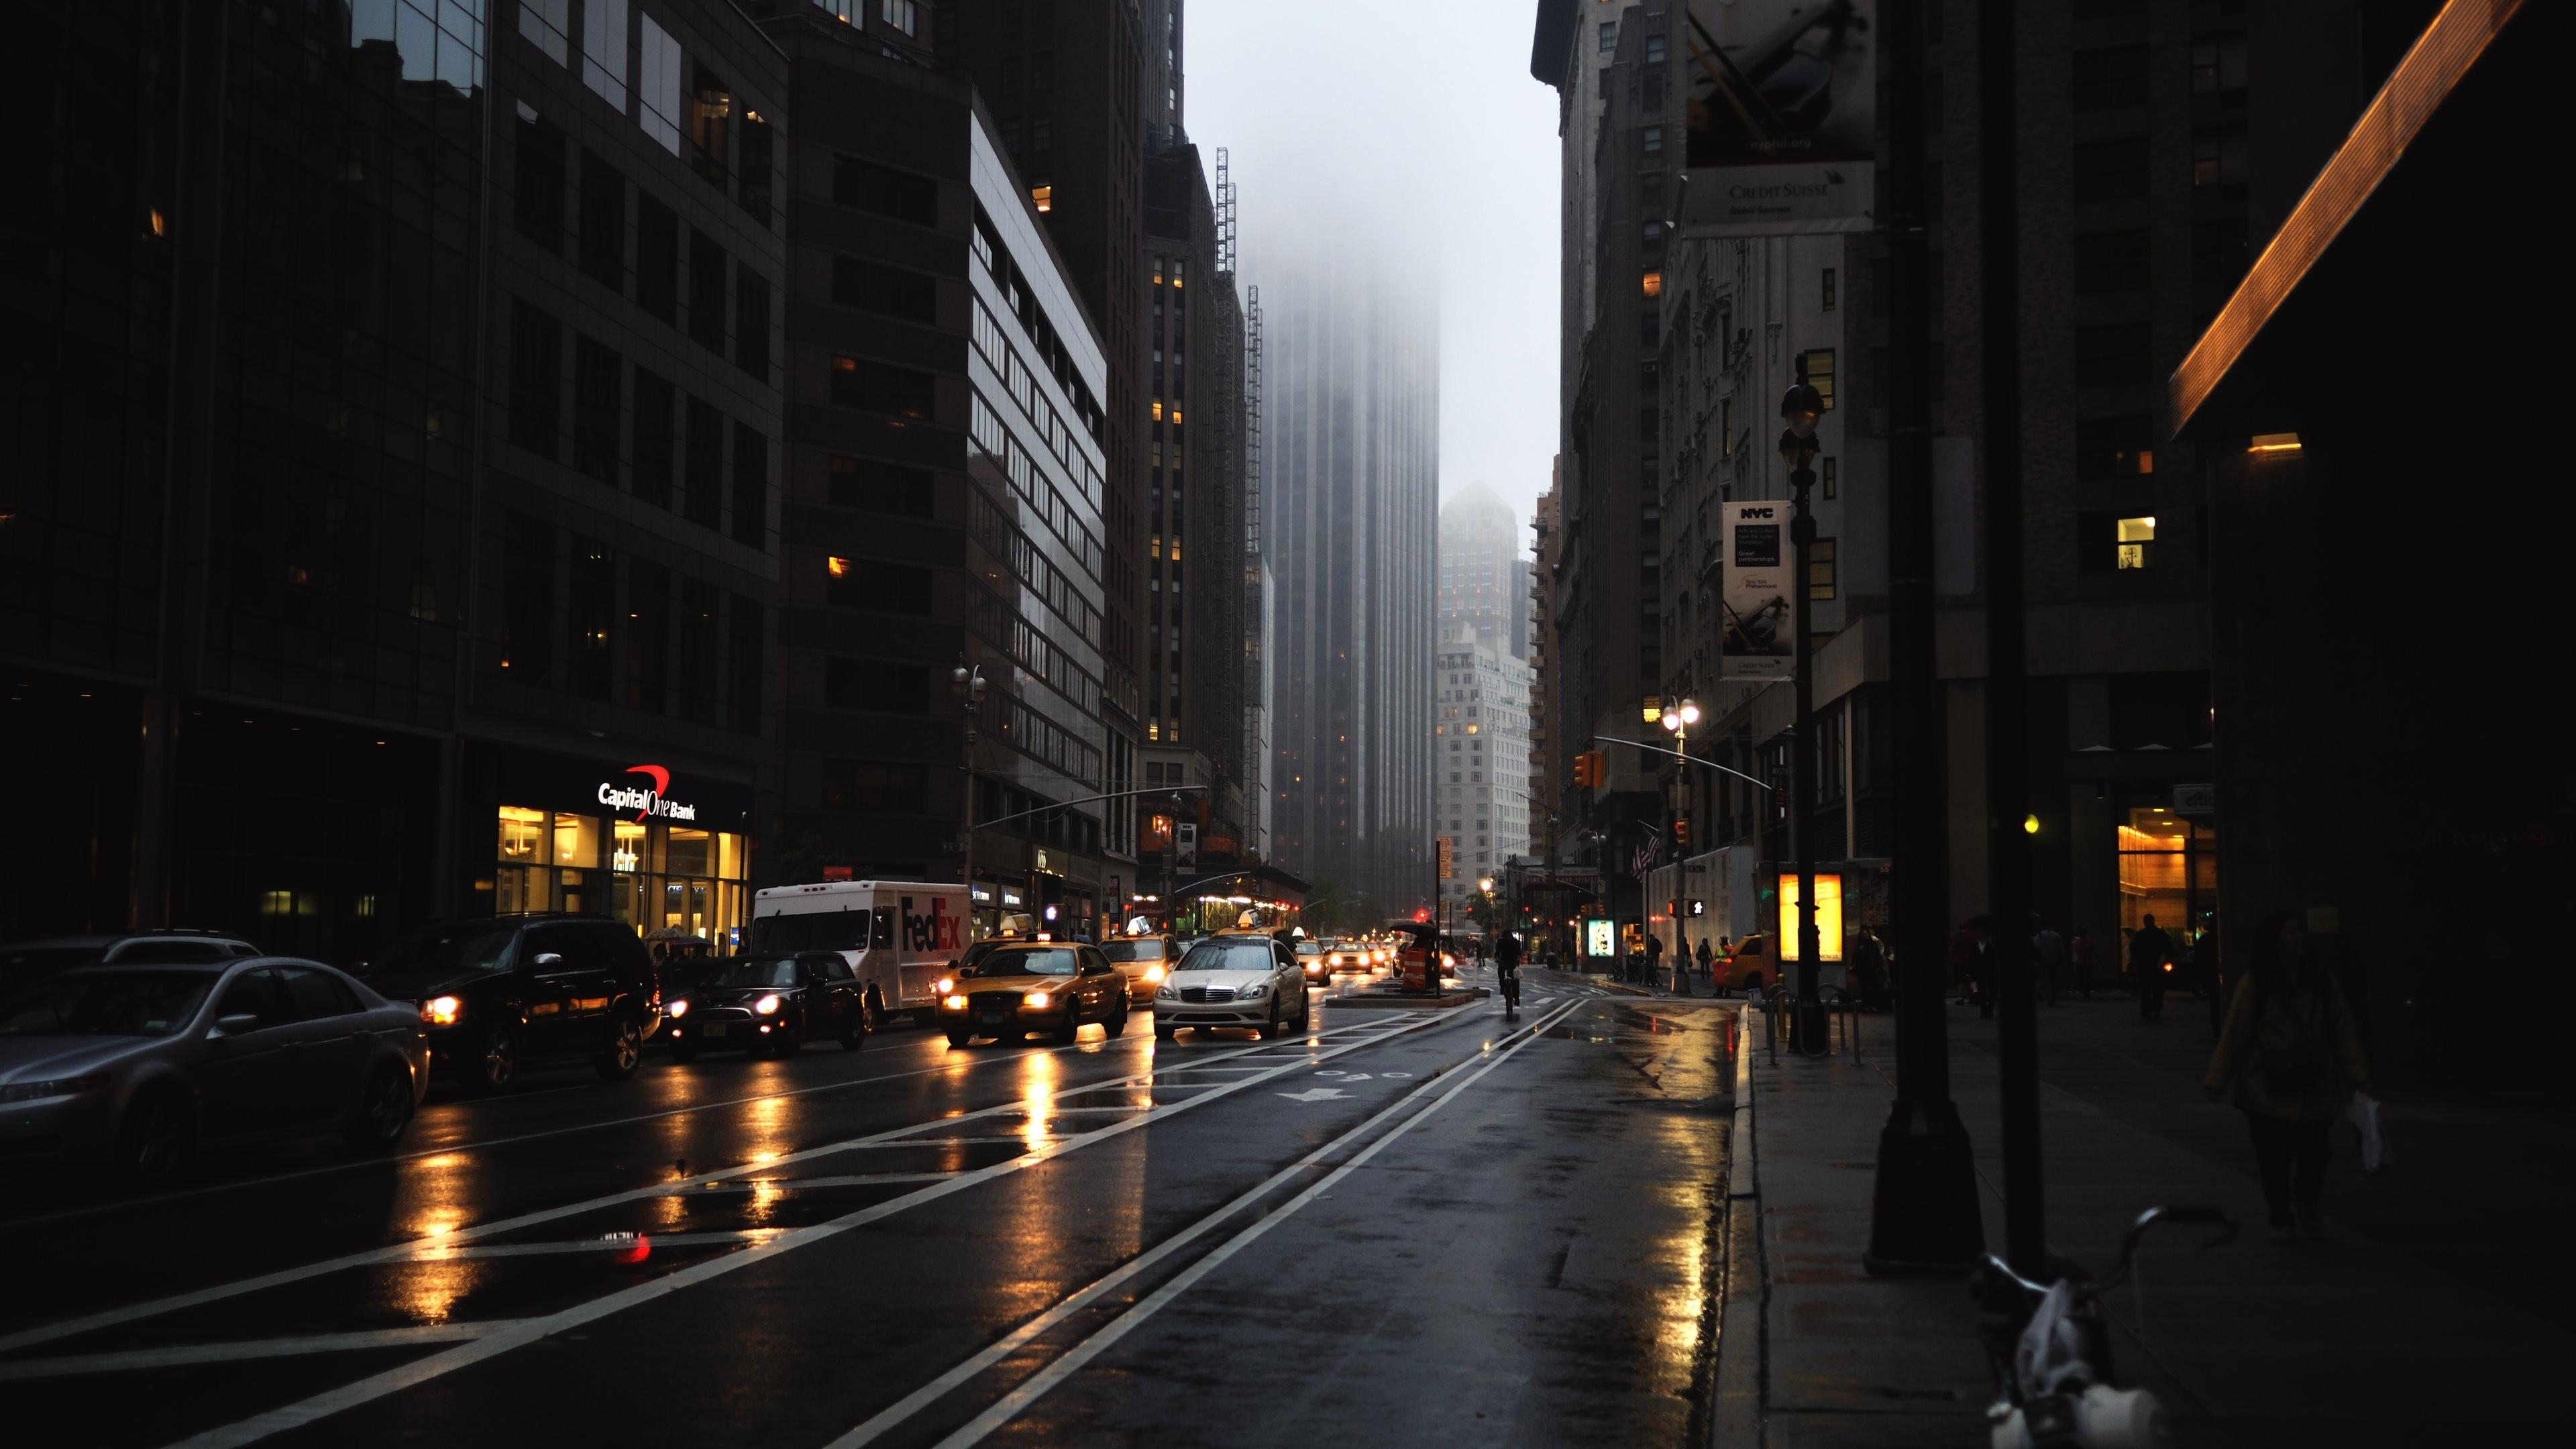 Rainy Day in New York City [3840×2160]